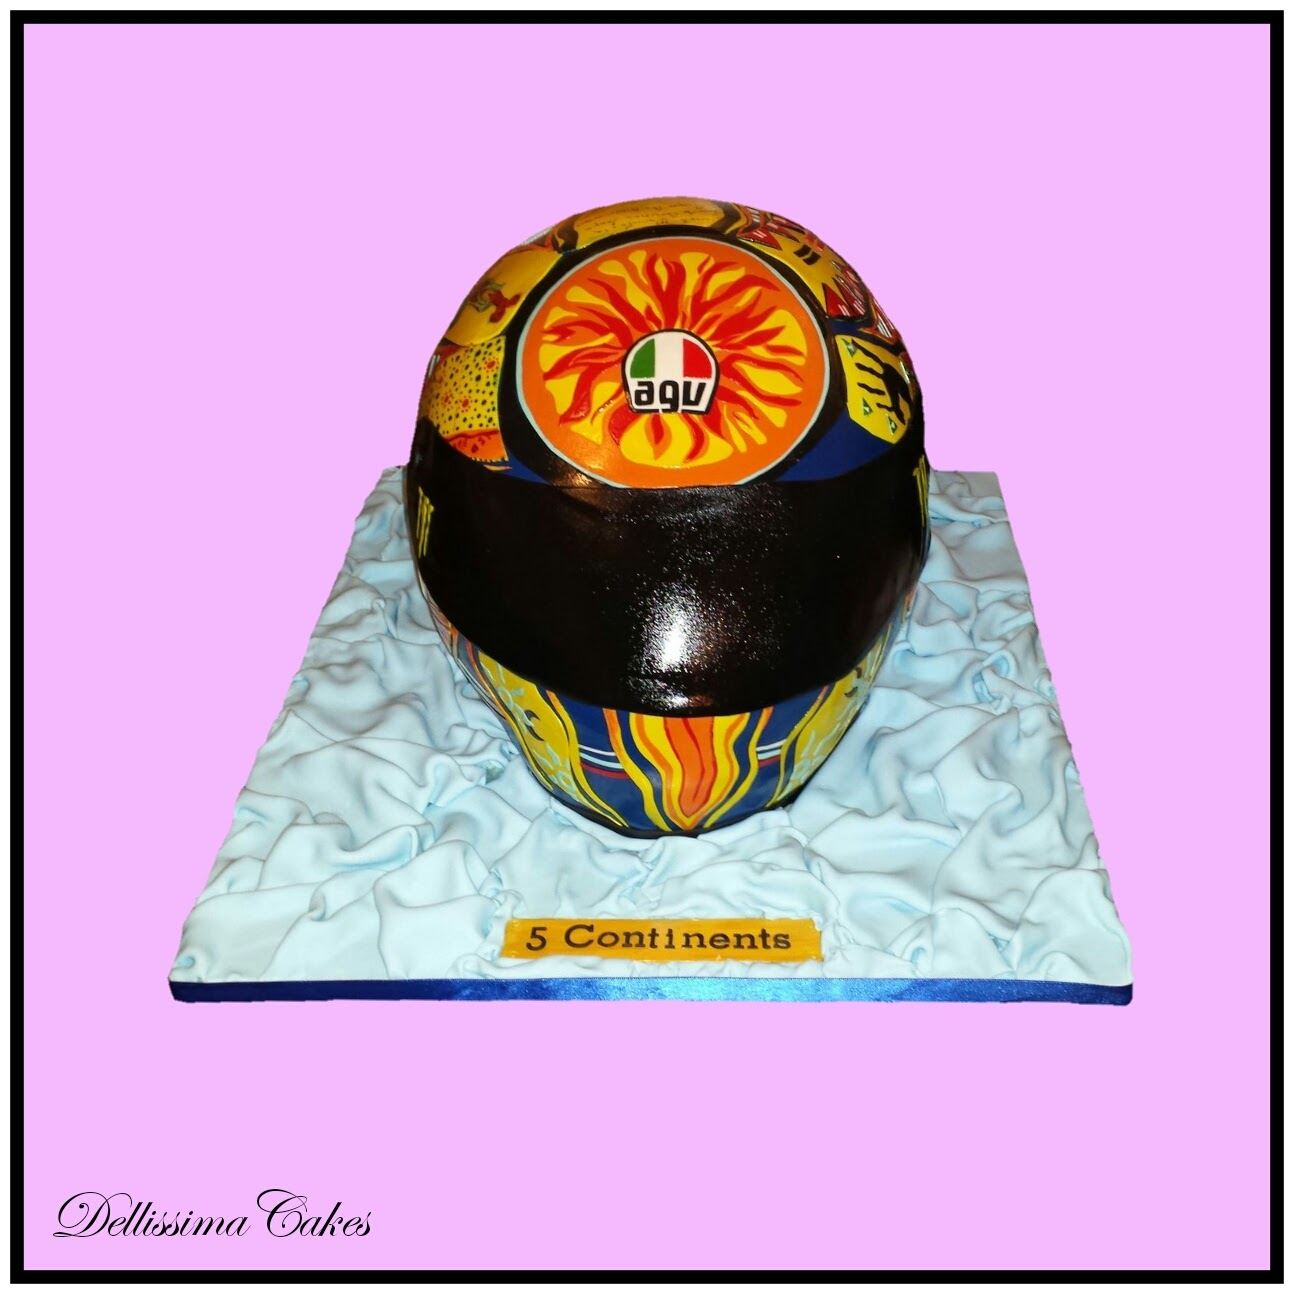 Valentino Rossi Helmet Cake 5-Continents 1.jpg